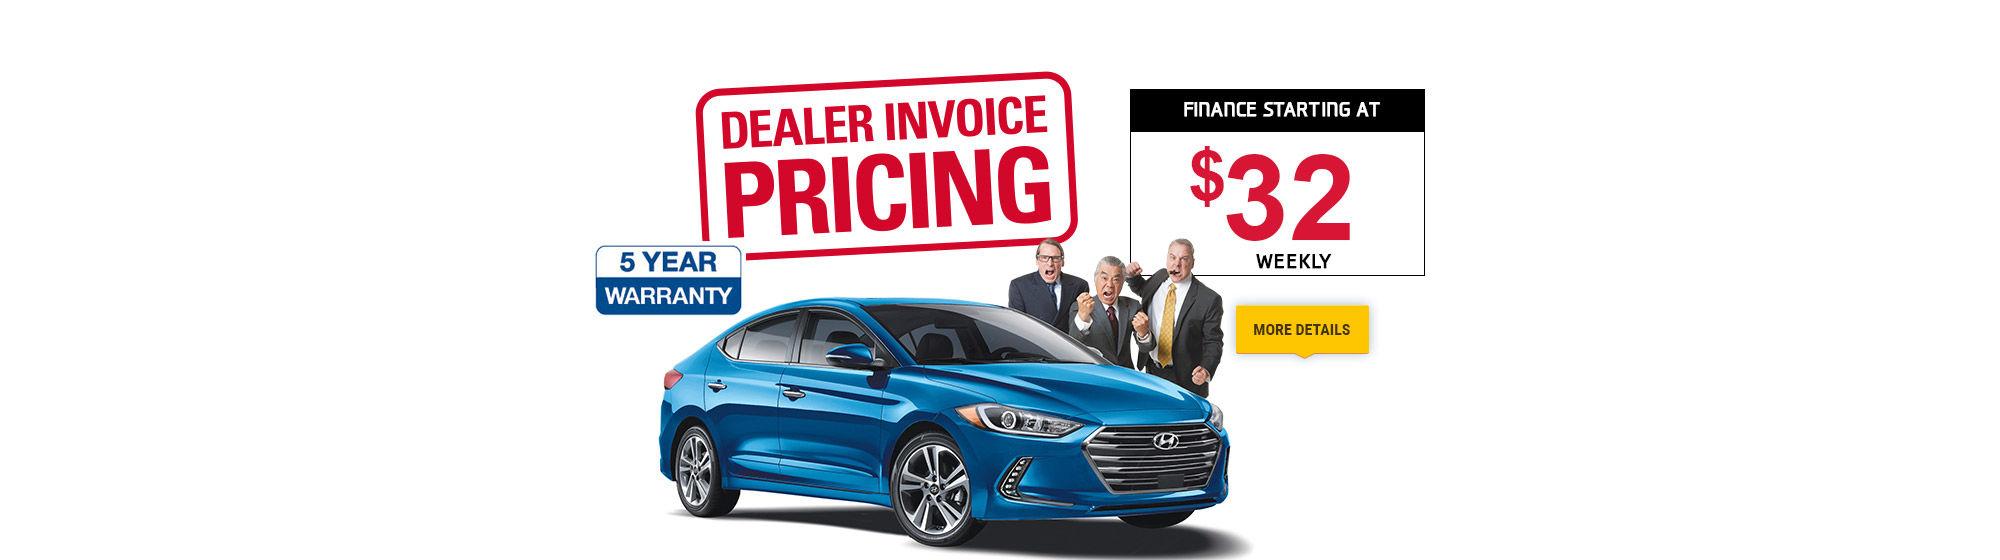 Dealer Invoice Pricing